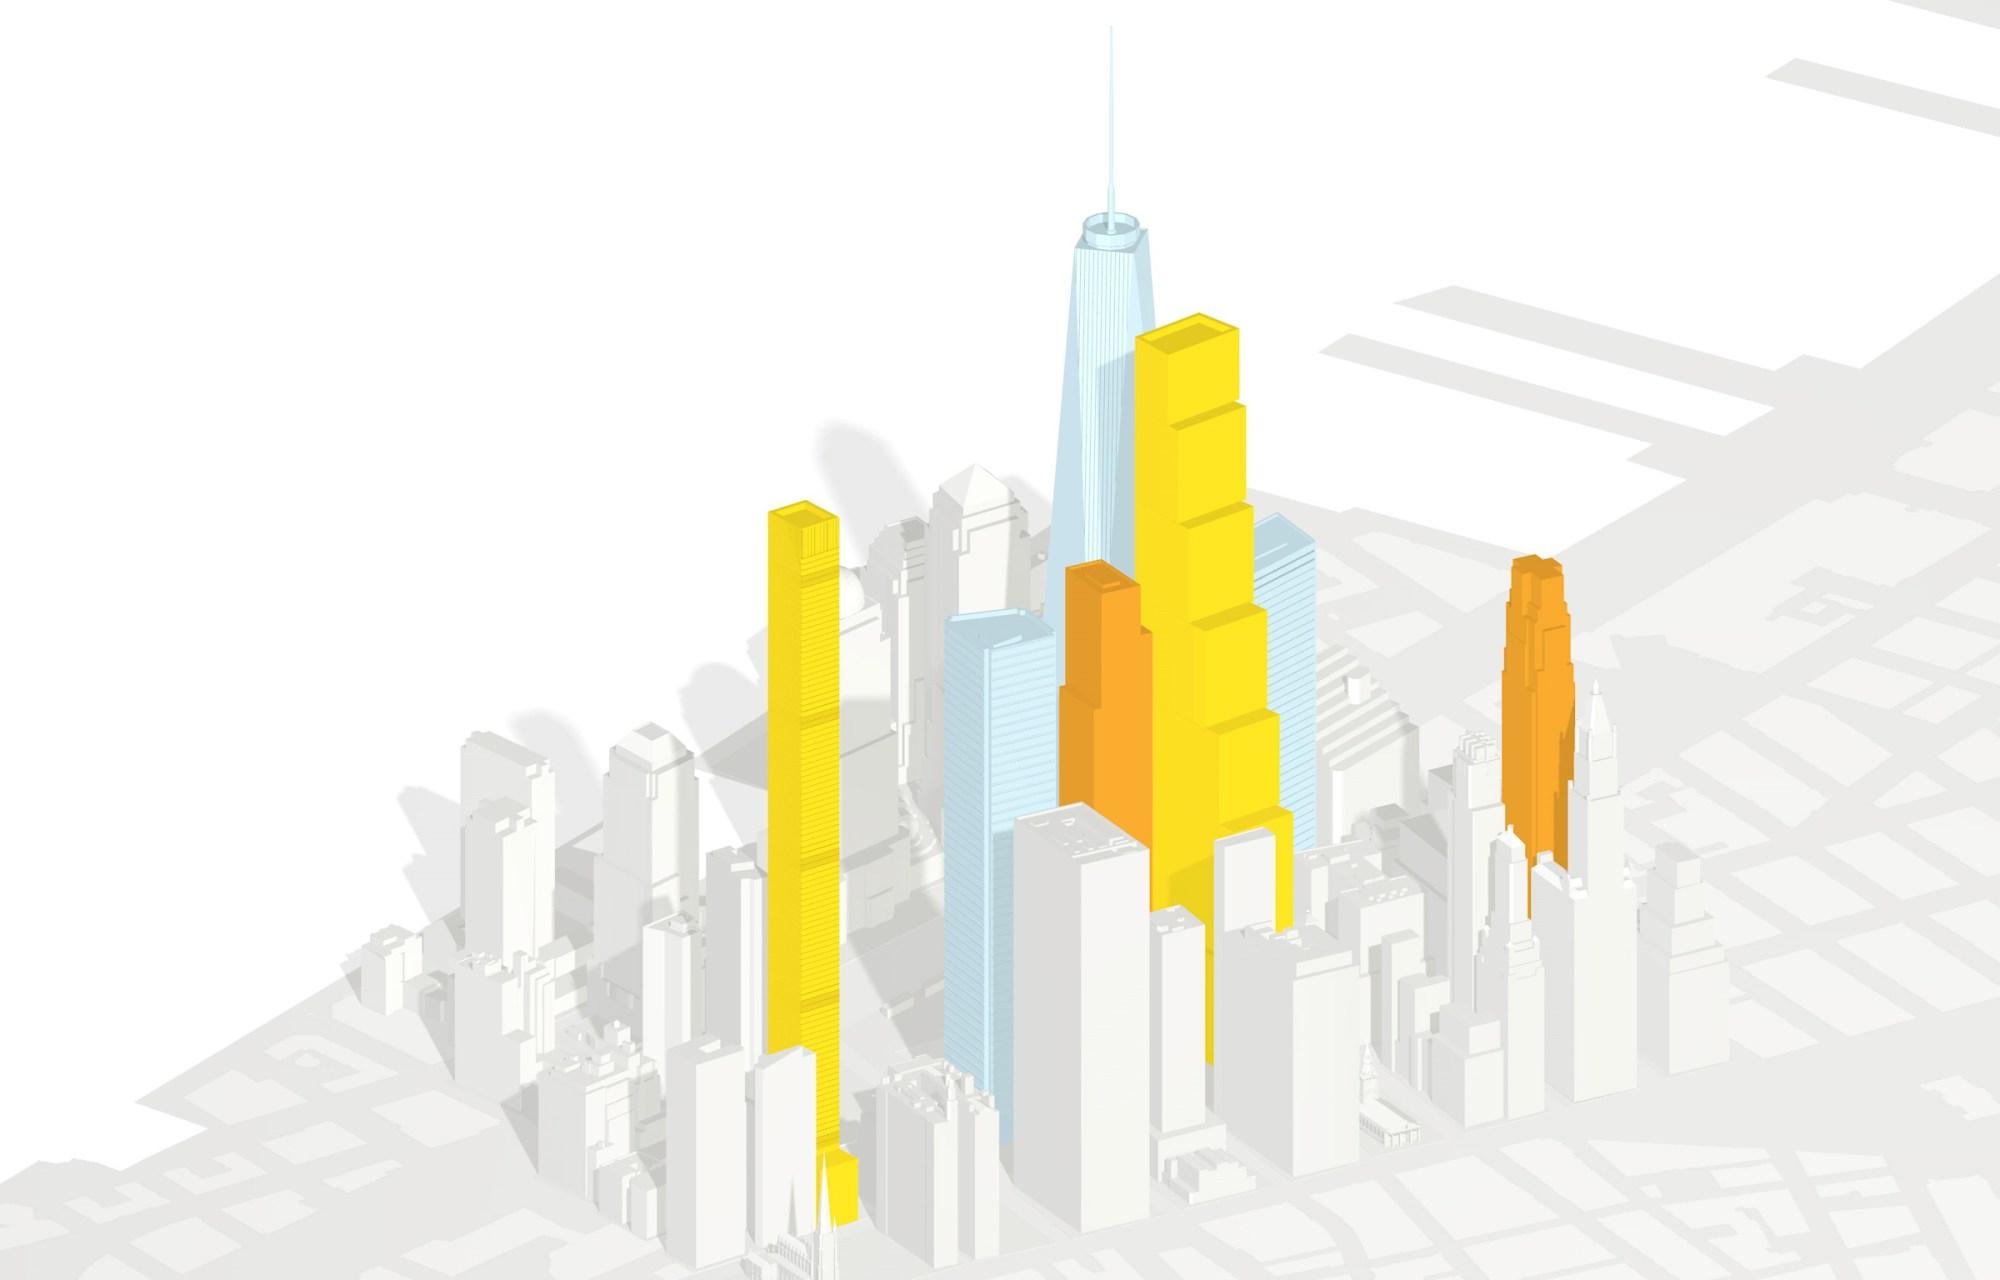 hight resolution of skyline diagram